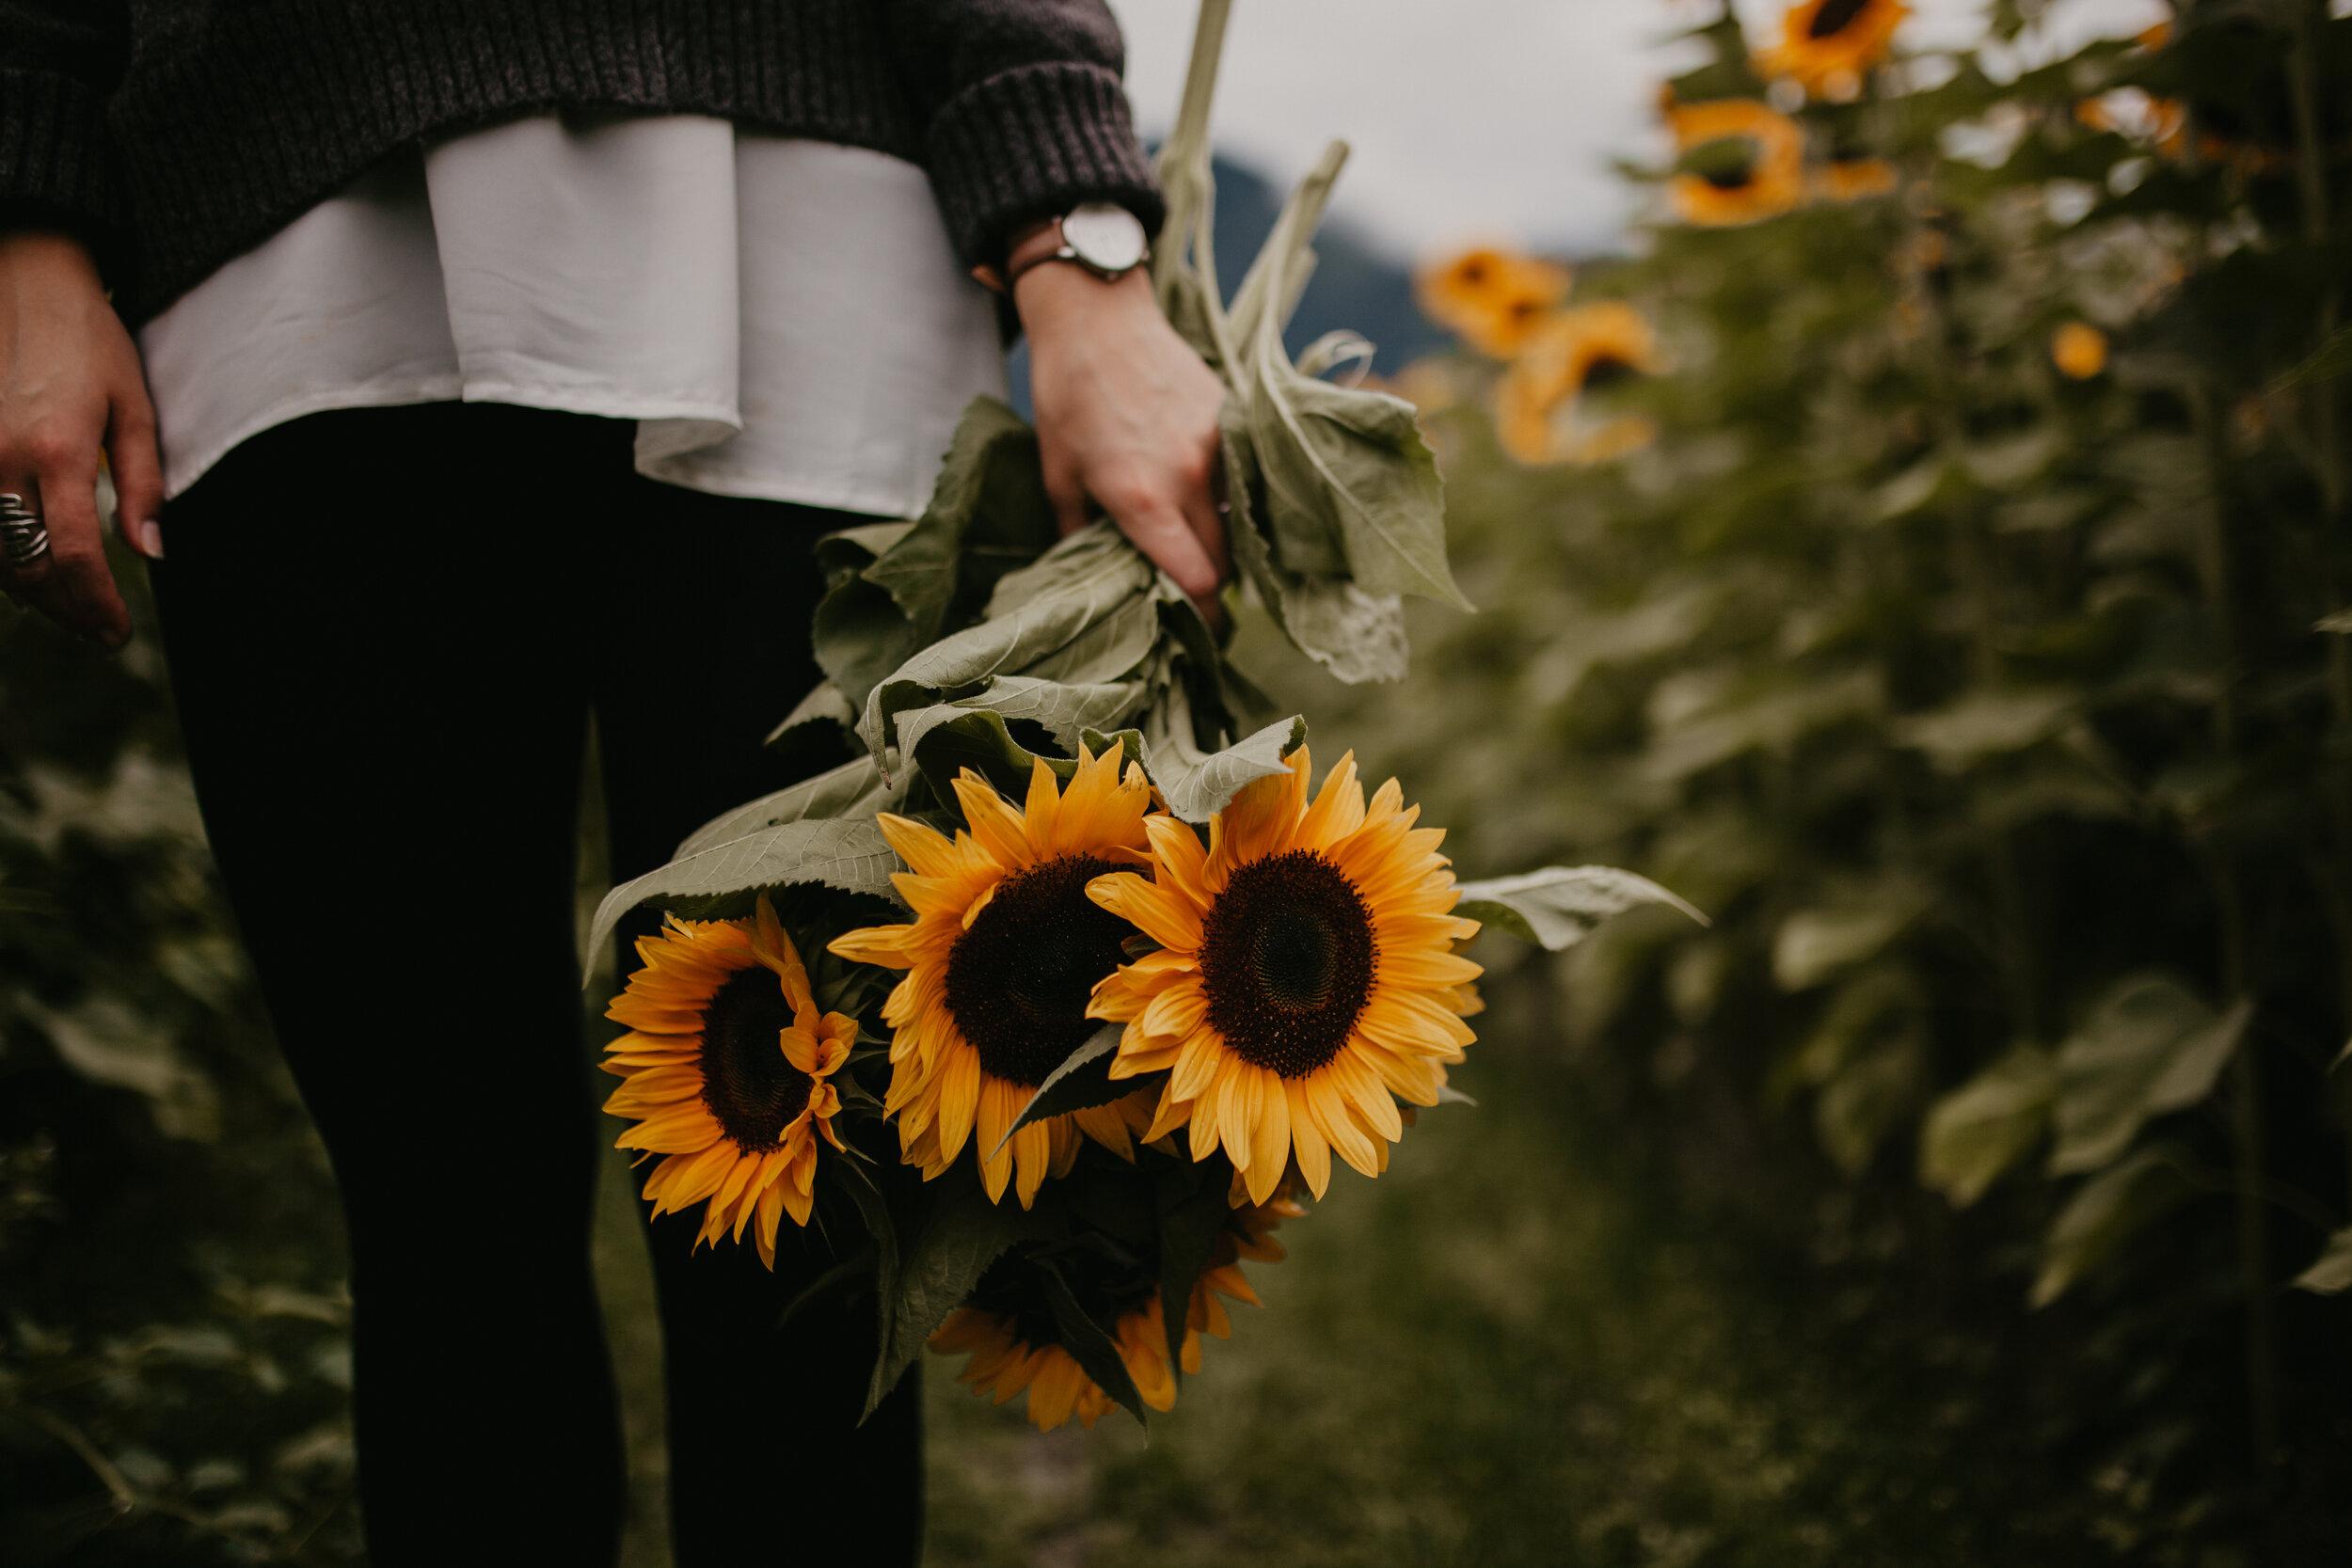 SunflowerFestival-36.jpg